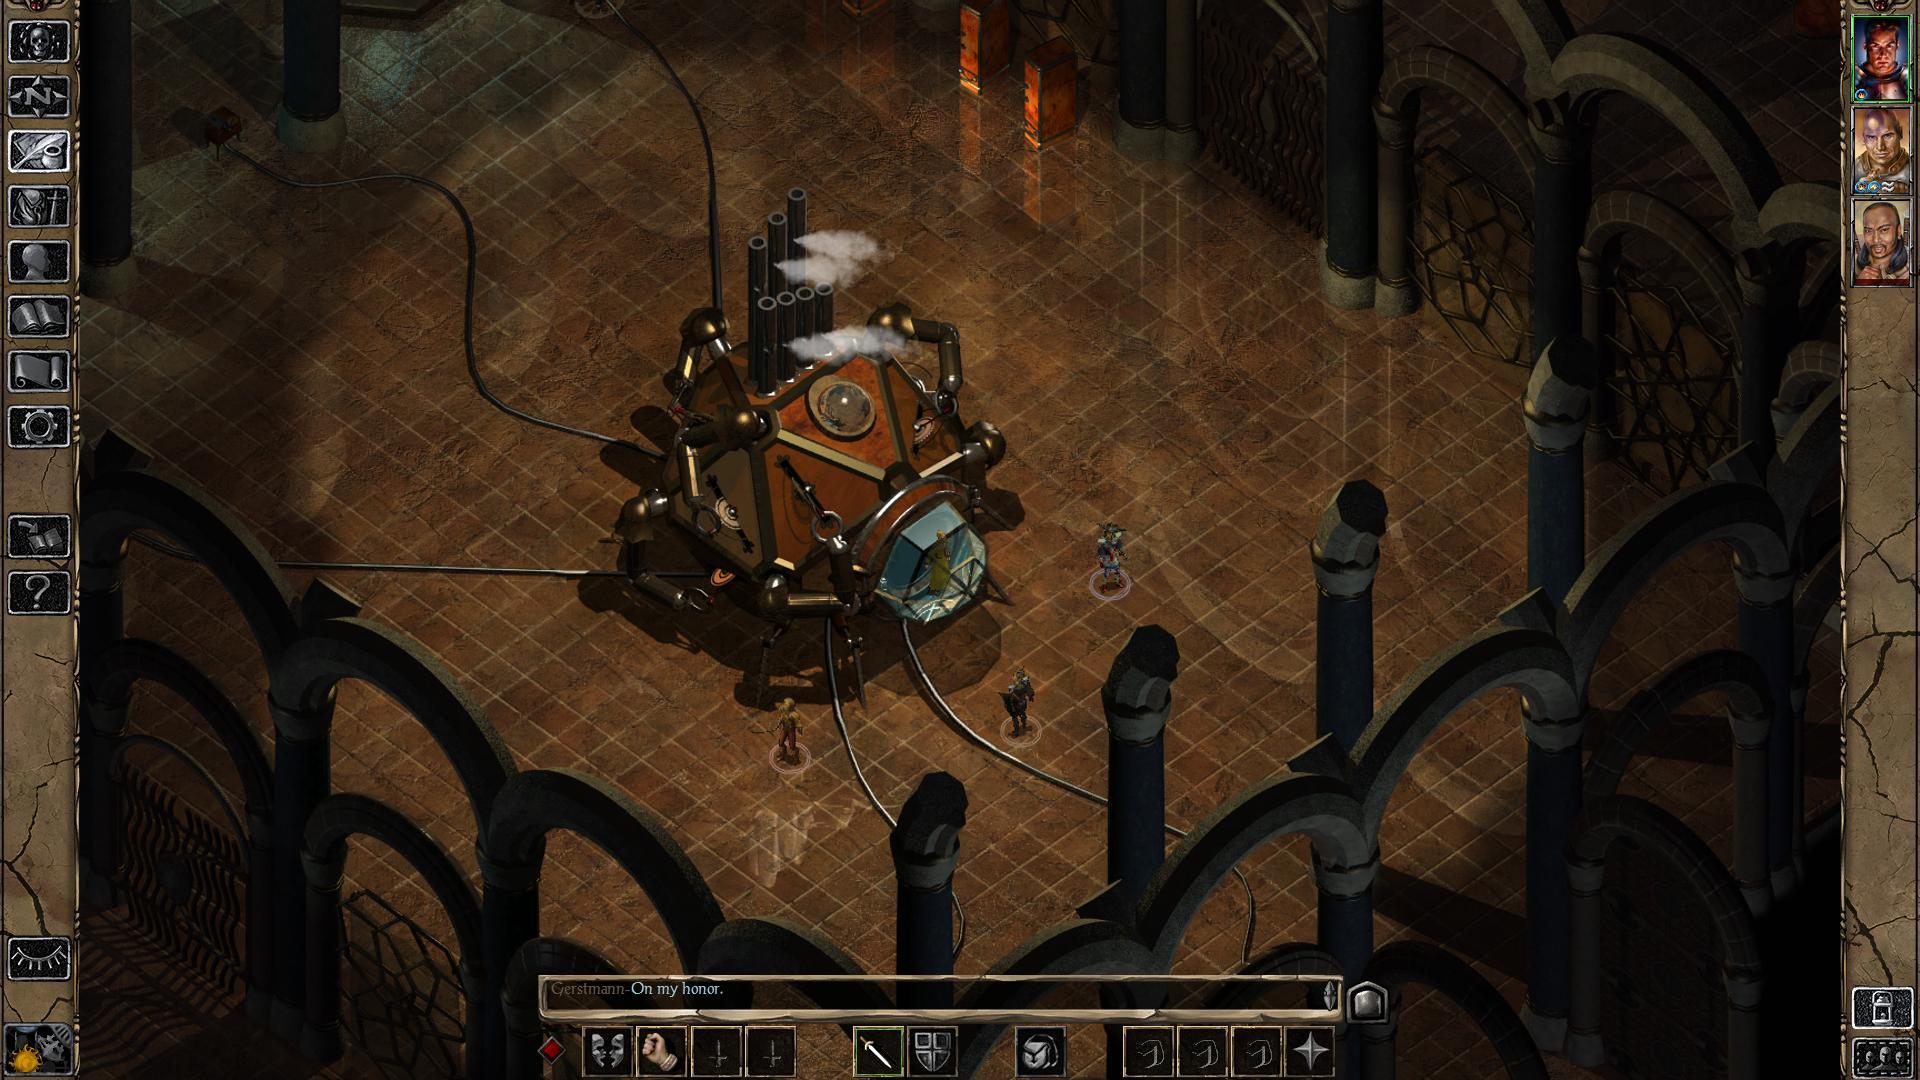 Baldurs Gate 2 Download For Free